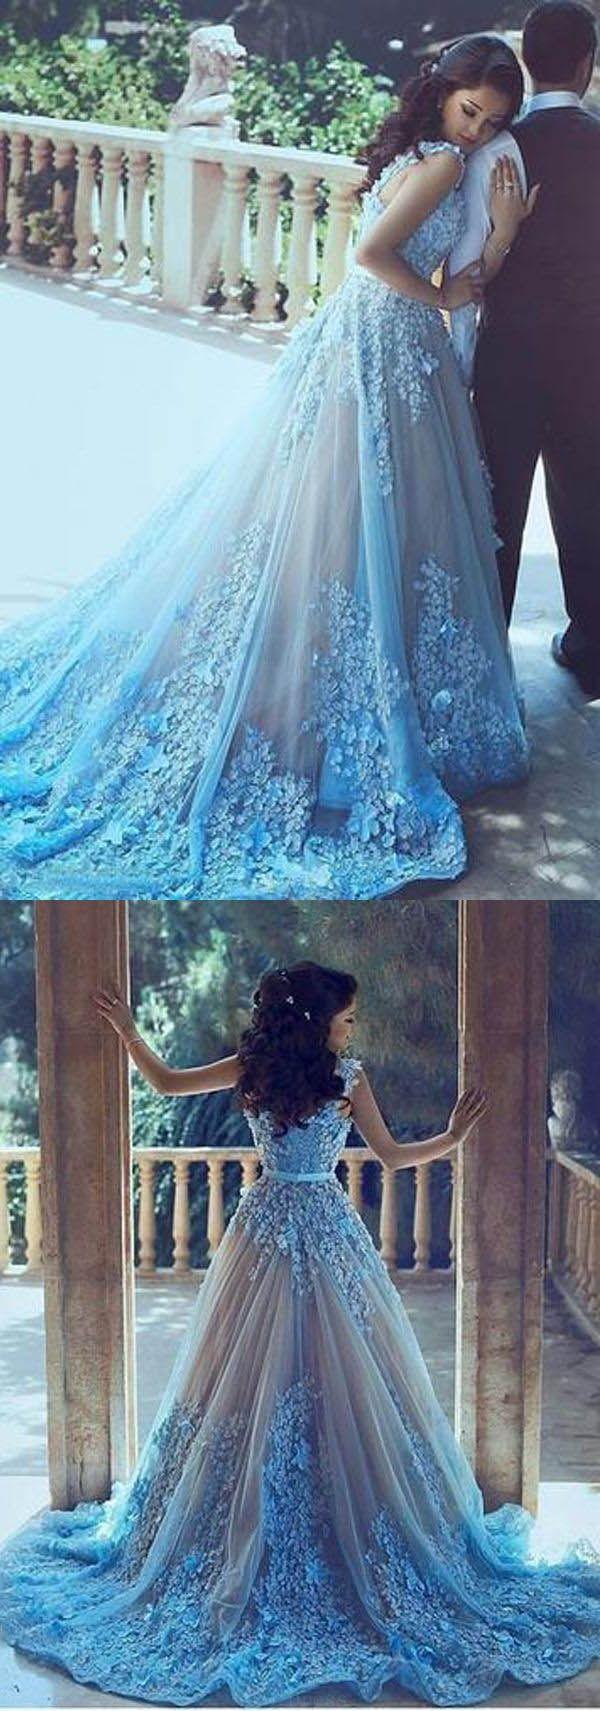 Custom made cute wedding dresses aline aline square chapel train